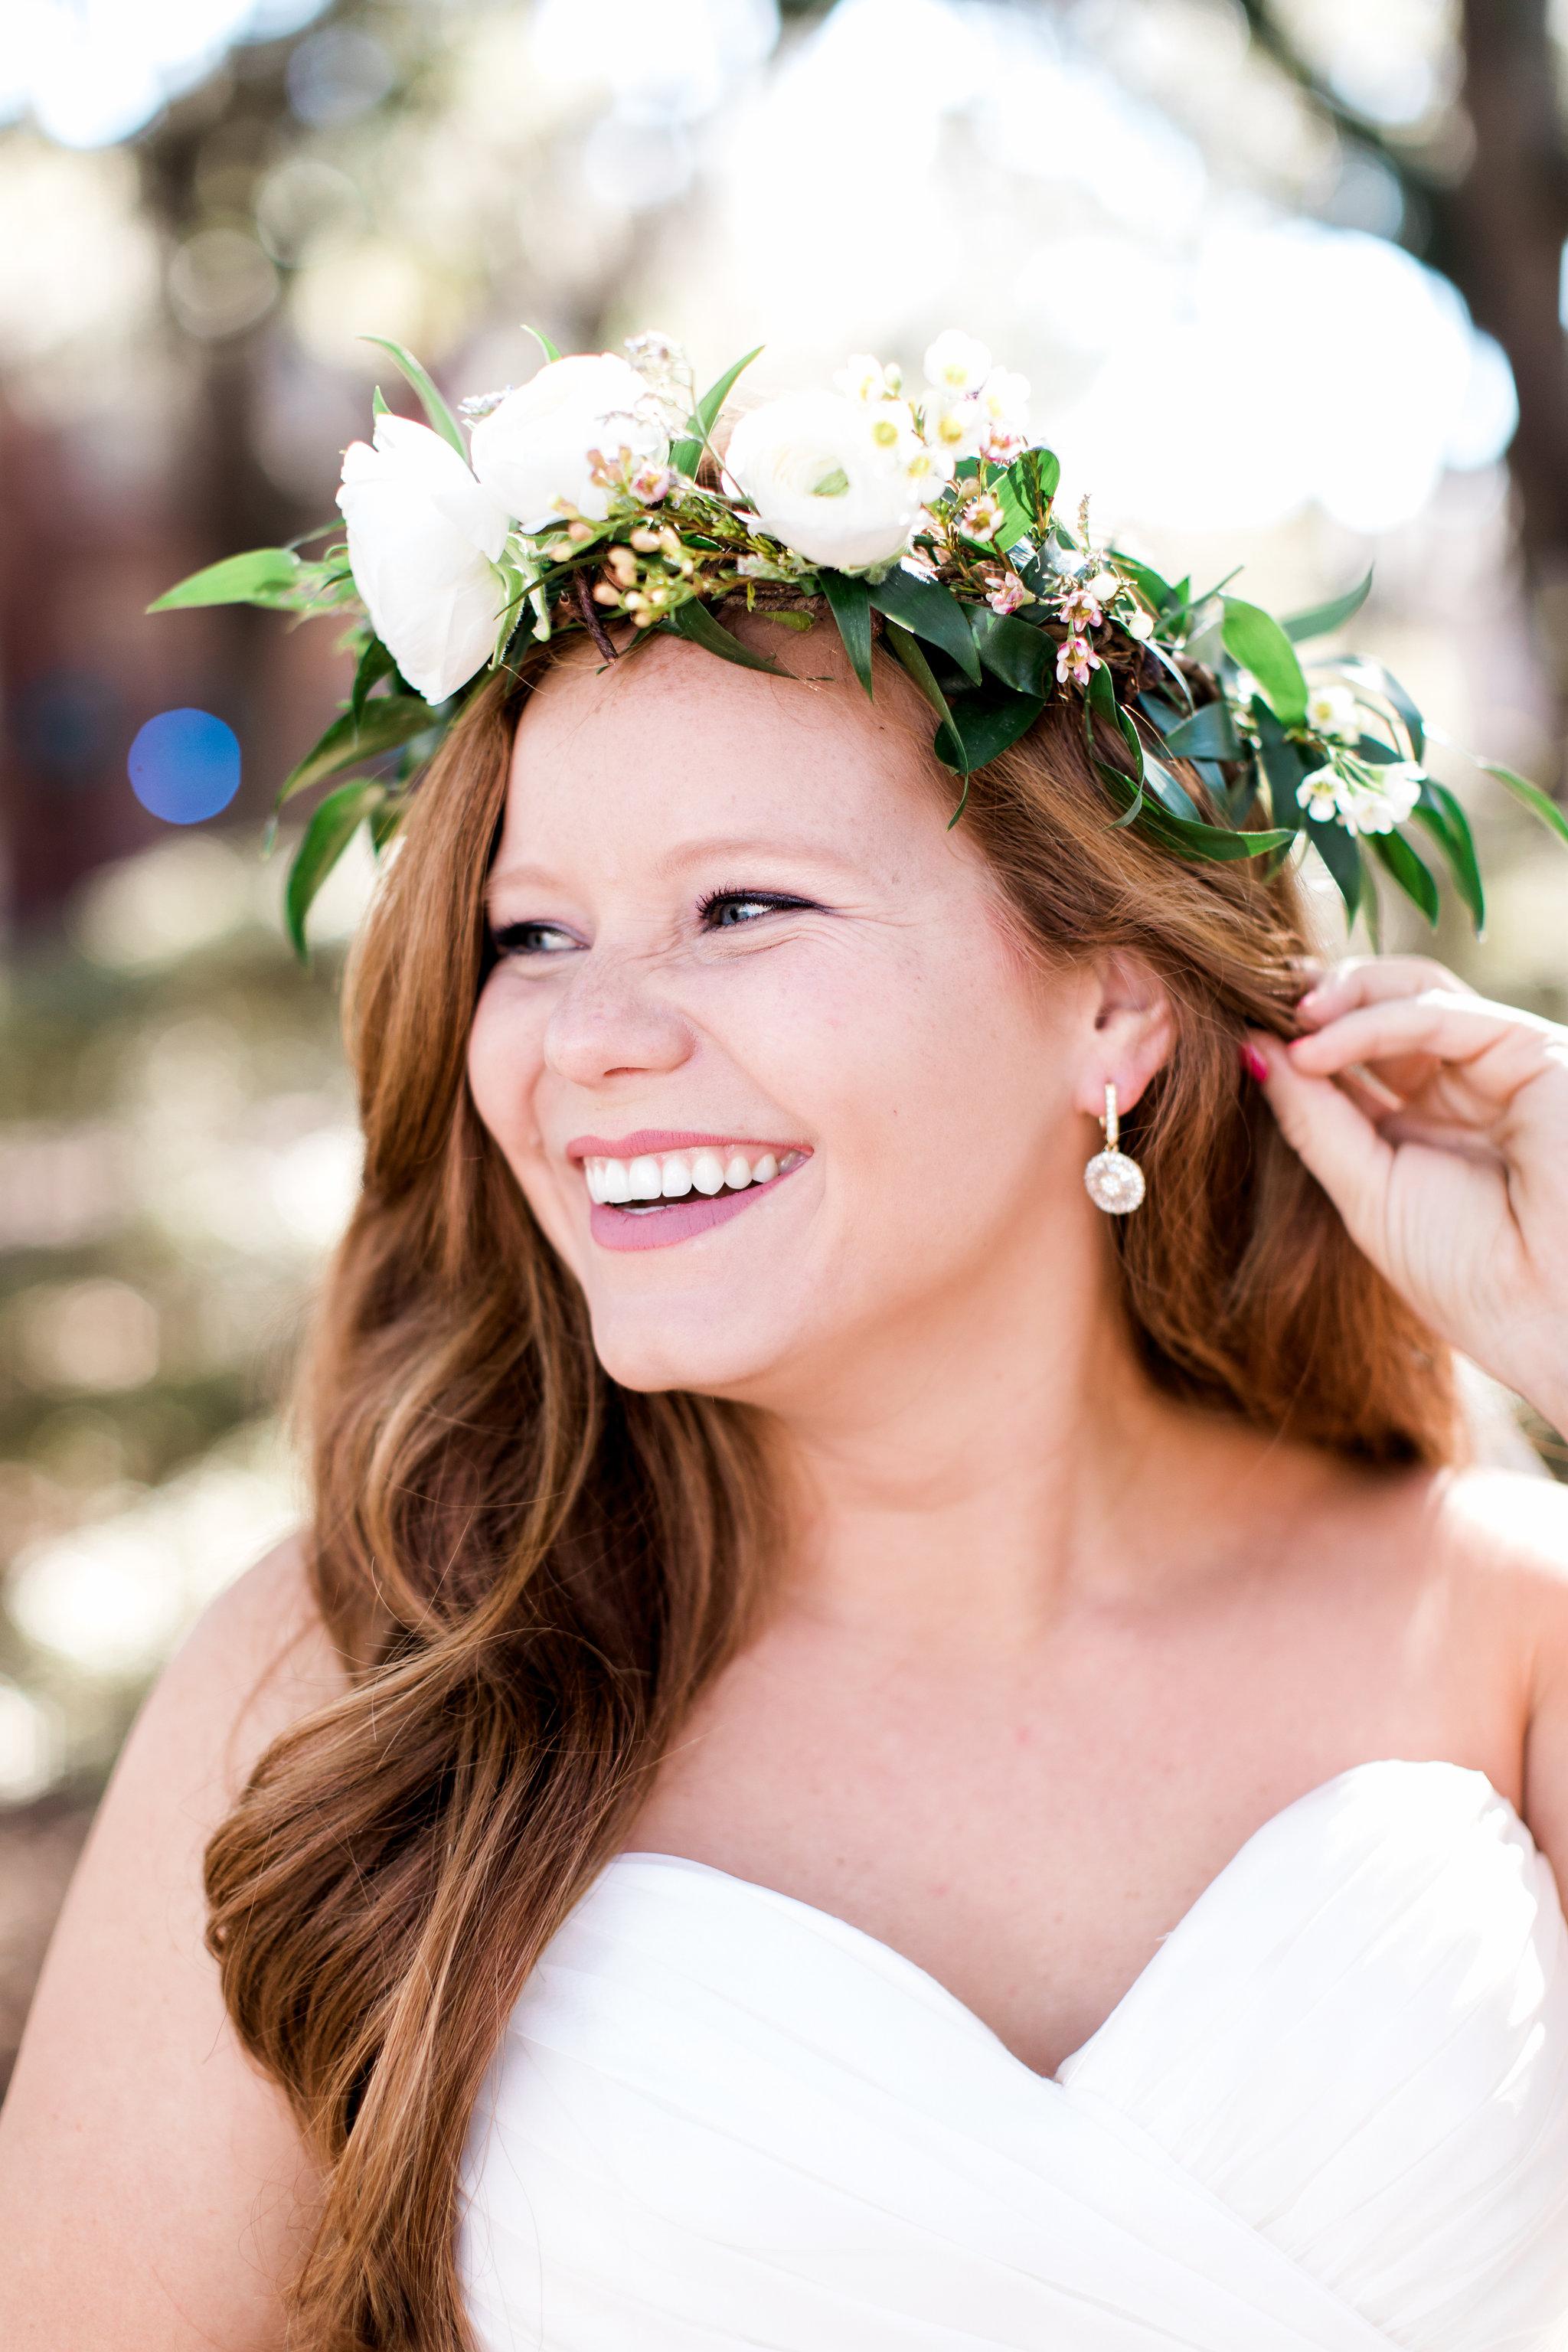 apt-b-photography-mary-elizabeths-bridal-boutique-adele-amelia-accessories-morilee-5504-savannah-bridal-boutique-savannah-weddings-savannah-wedding-photographer-savannah-bridal-gowns-savannah-wedding-dresses-historic-savannah-wedding-15.jpg